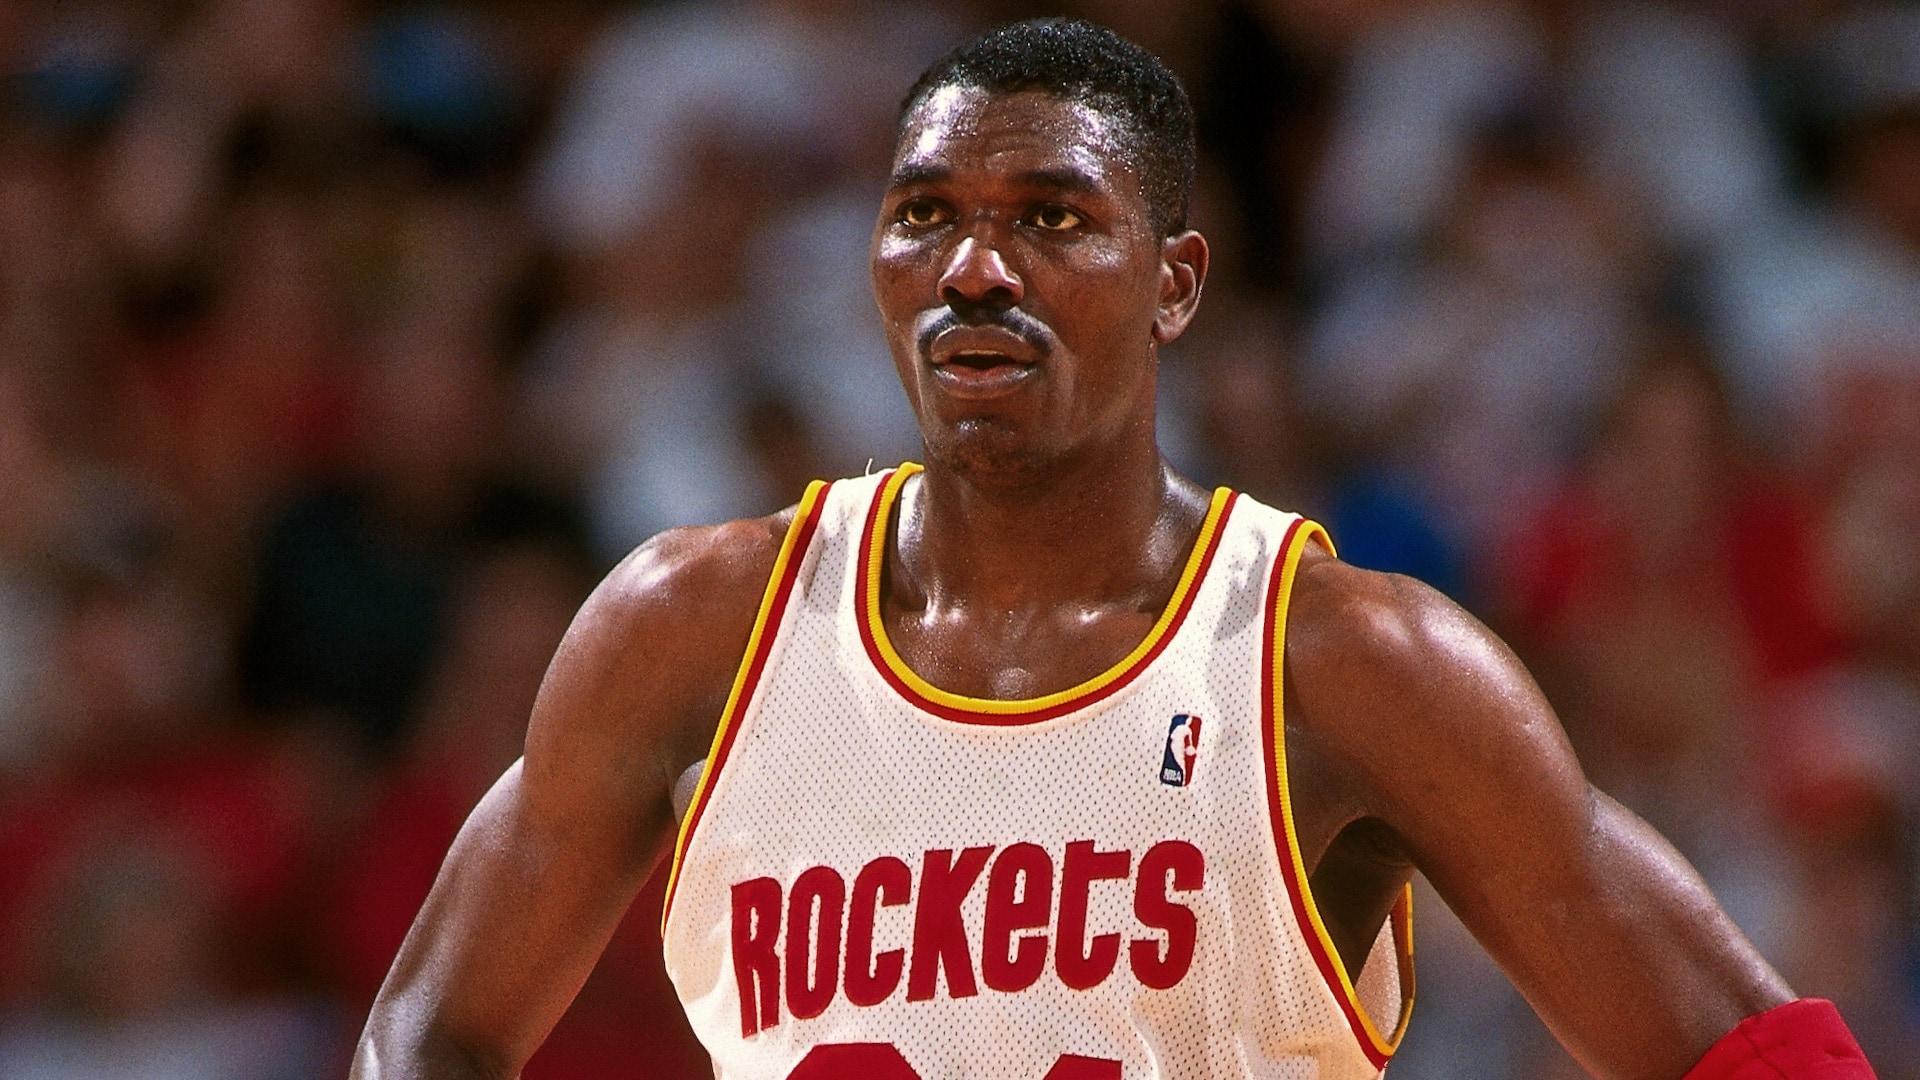 Legends profile: Hakeem Olajuwon